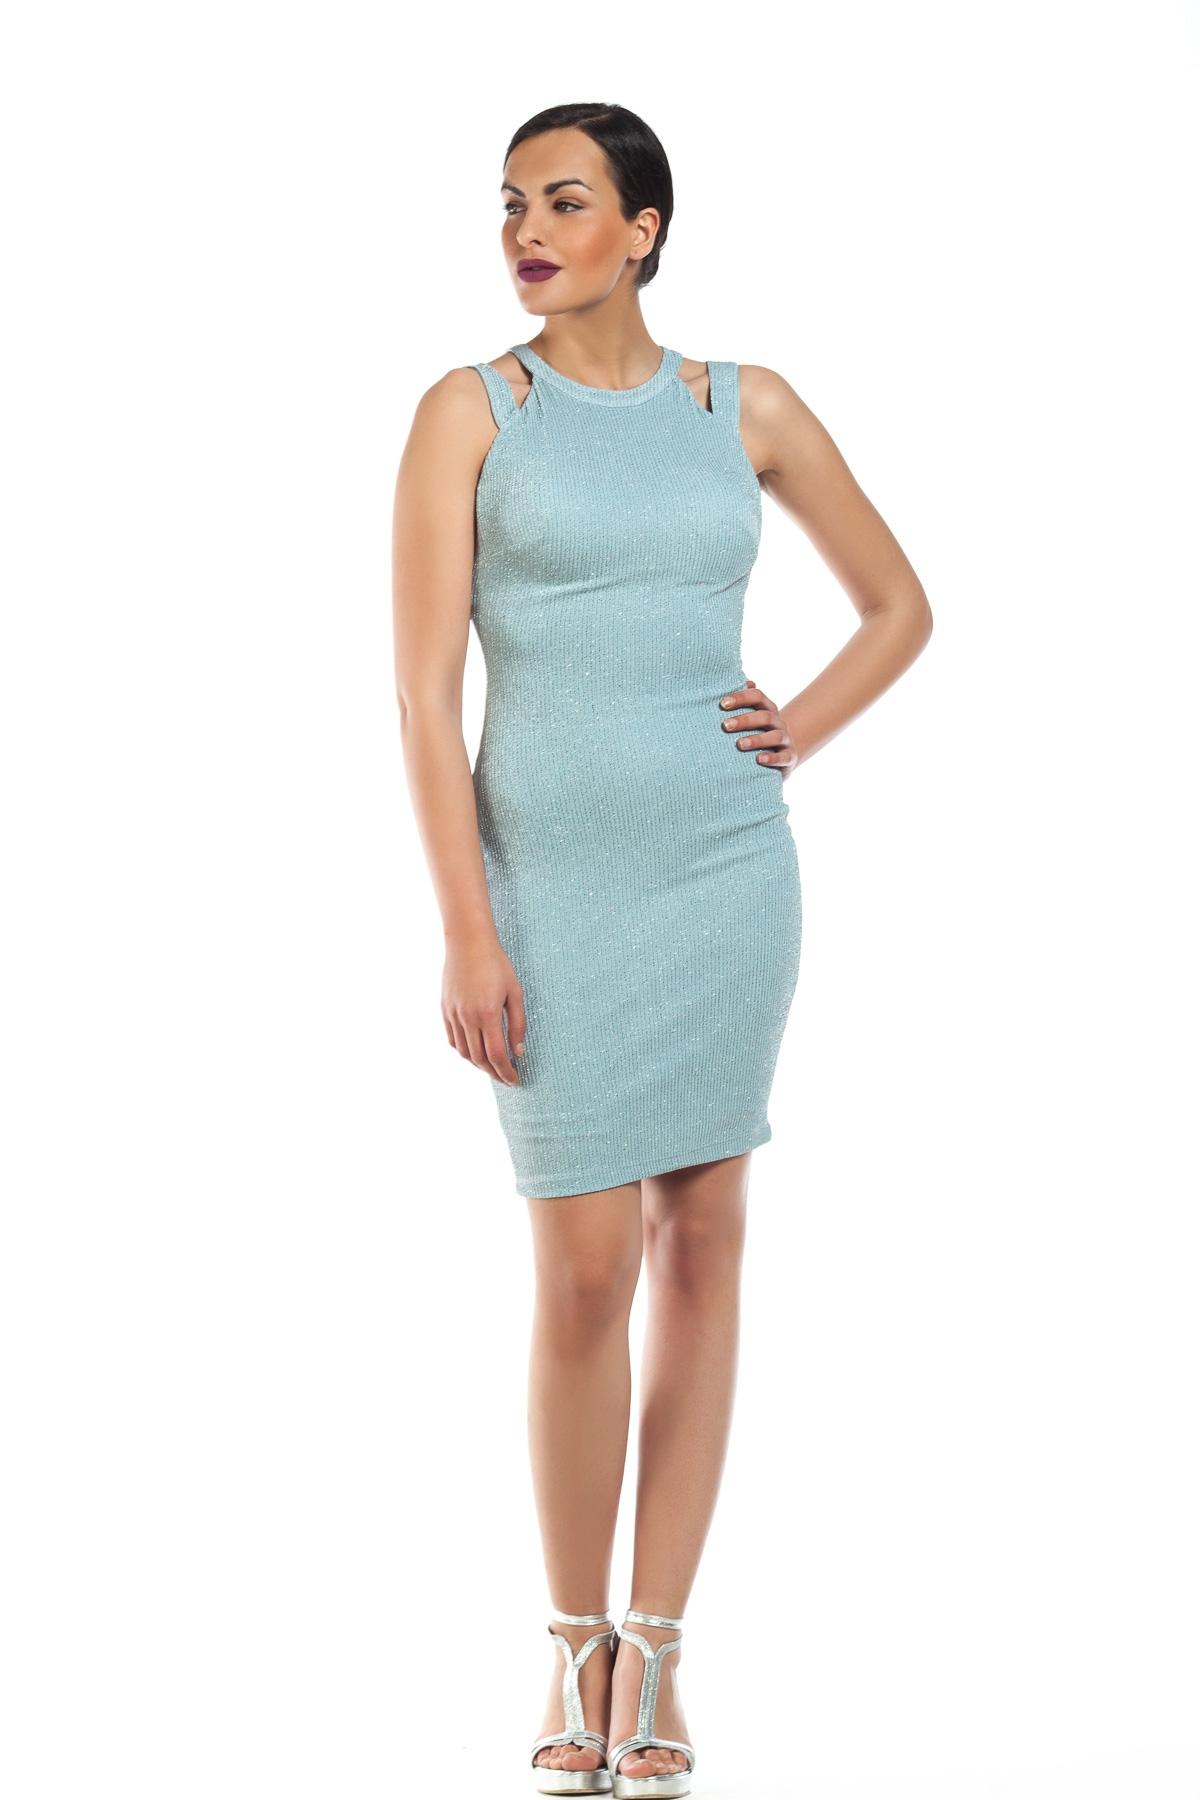 50adac6387b8 Φόρεμα γαλάζιο pencil με glitter